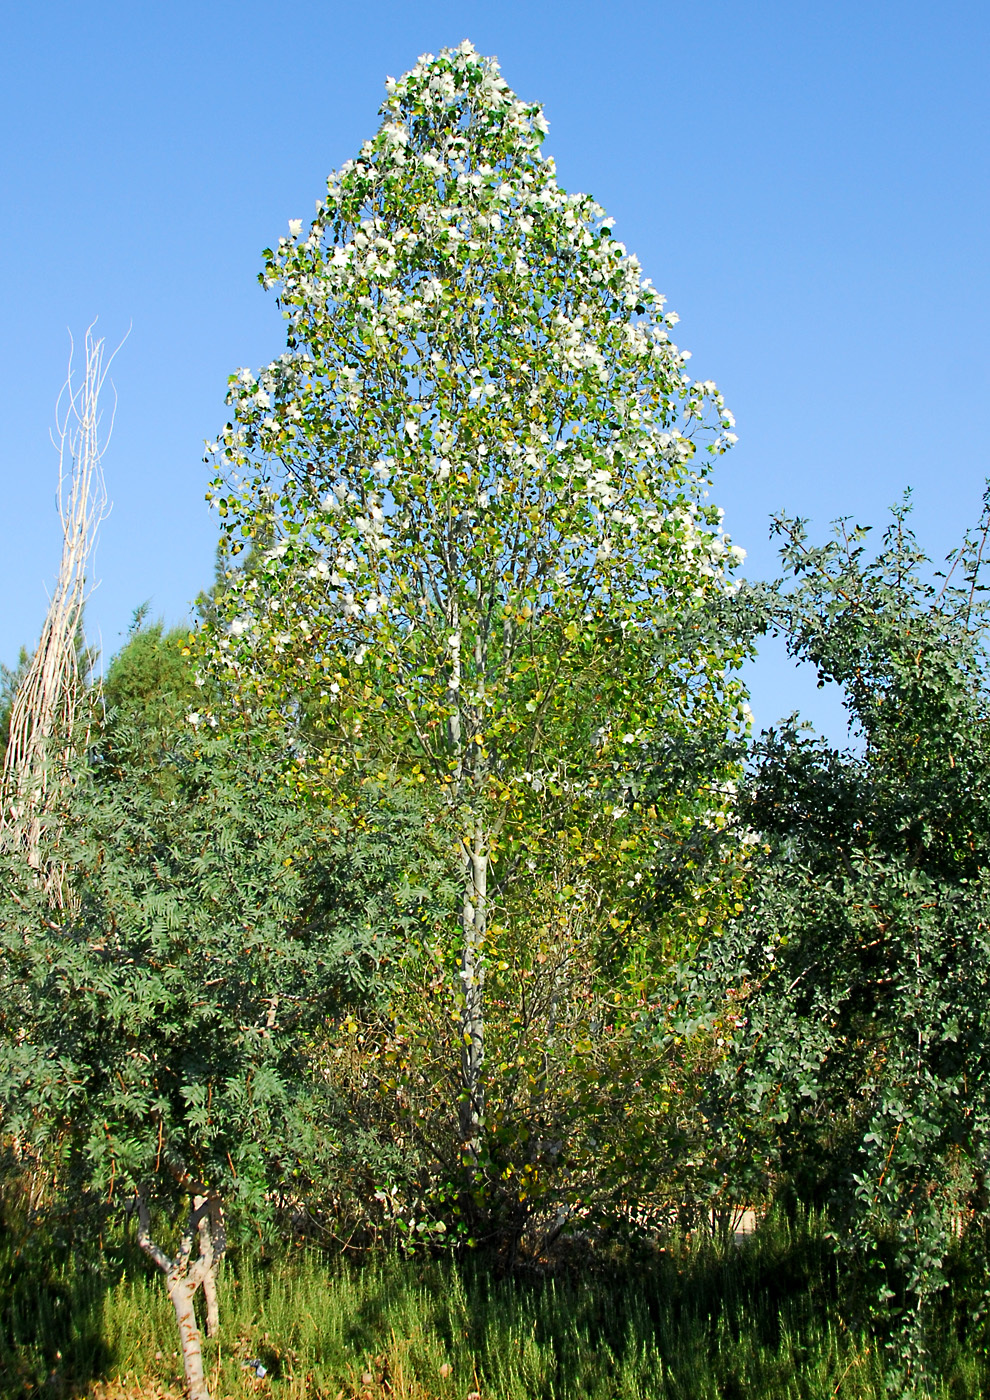 https://pictures.bgbm.org/digilib/Scaler?fn=Cyprus/Populus_alba_A1.jpg&mo=file